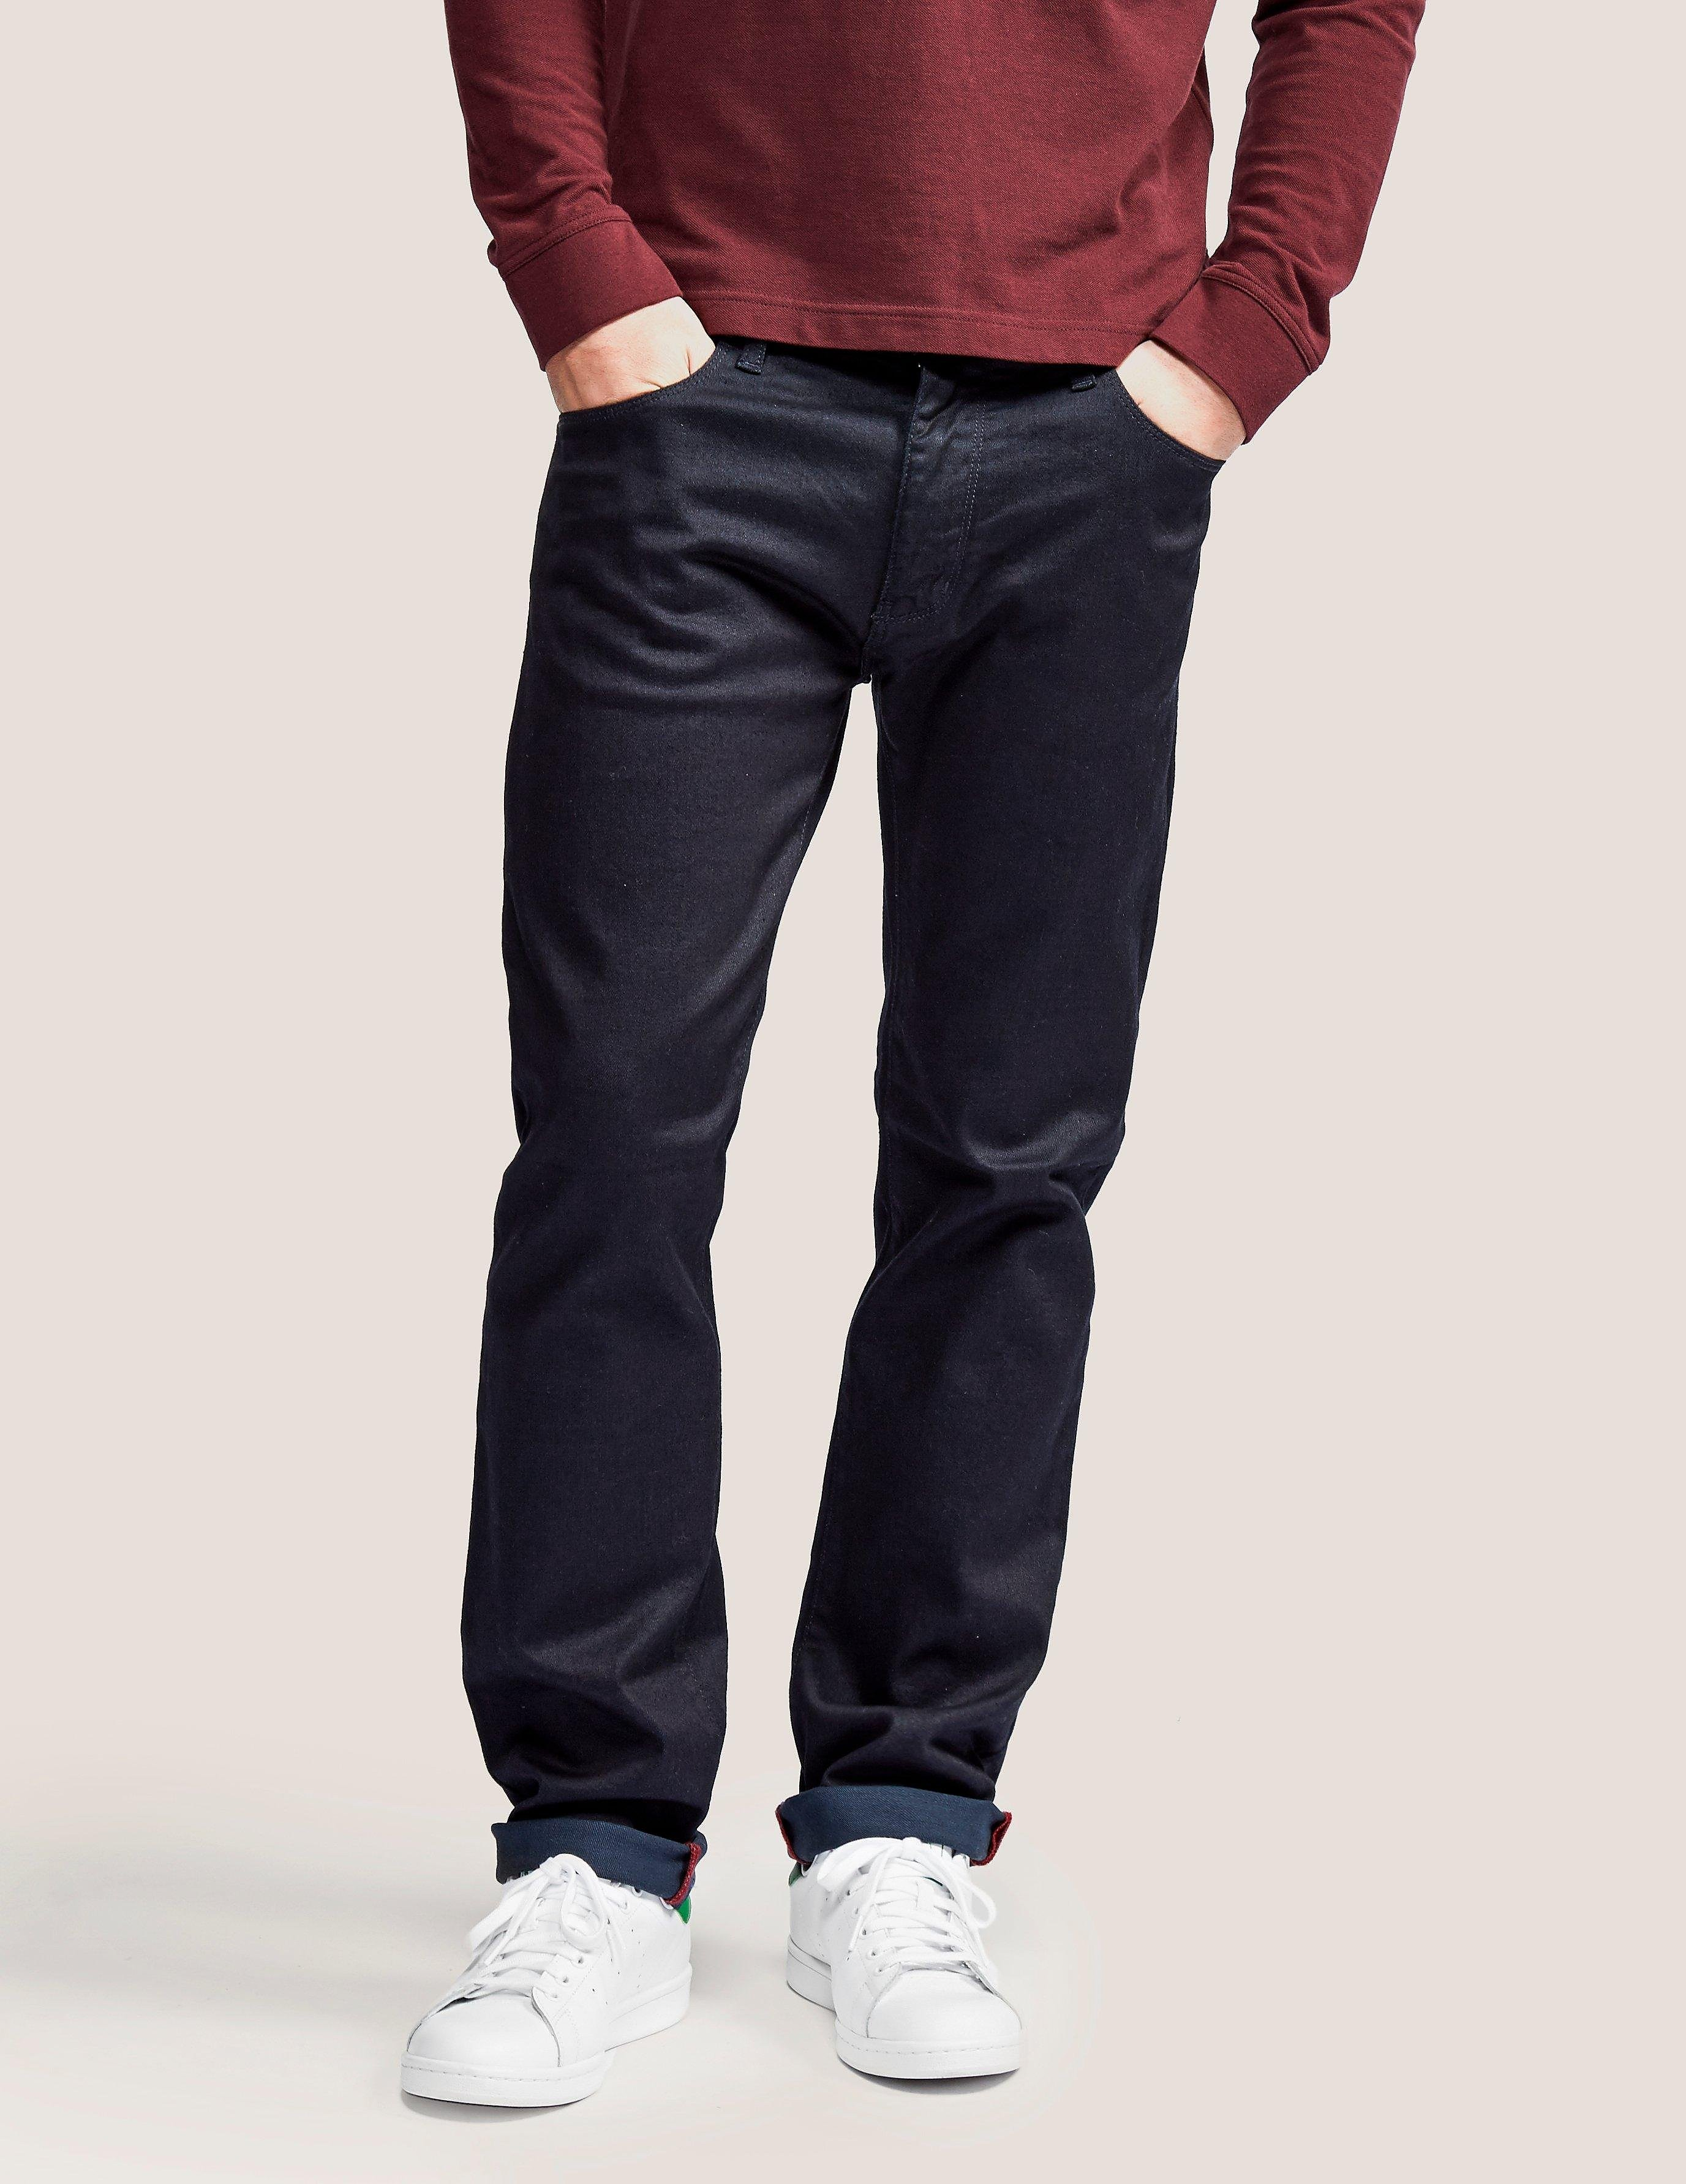 Armani Jeans J45 Overdye Regular Fit Jeans - Long